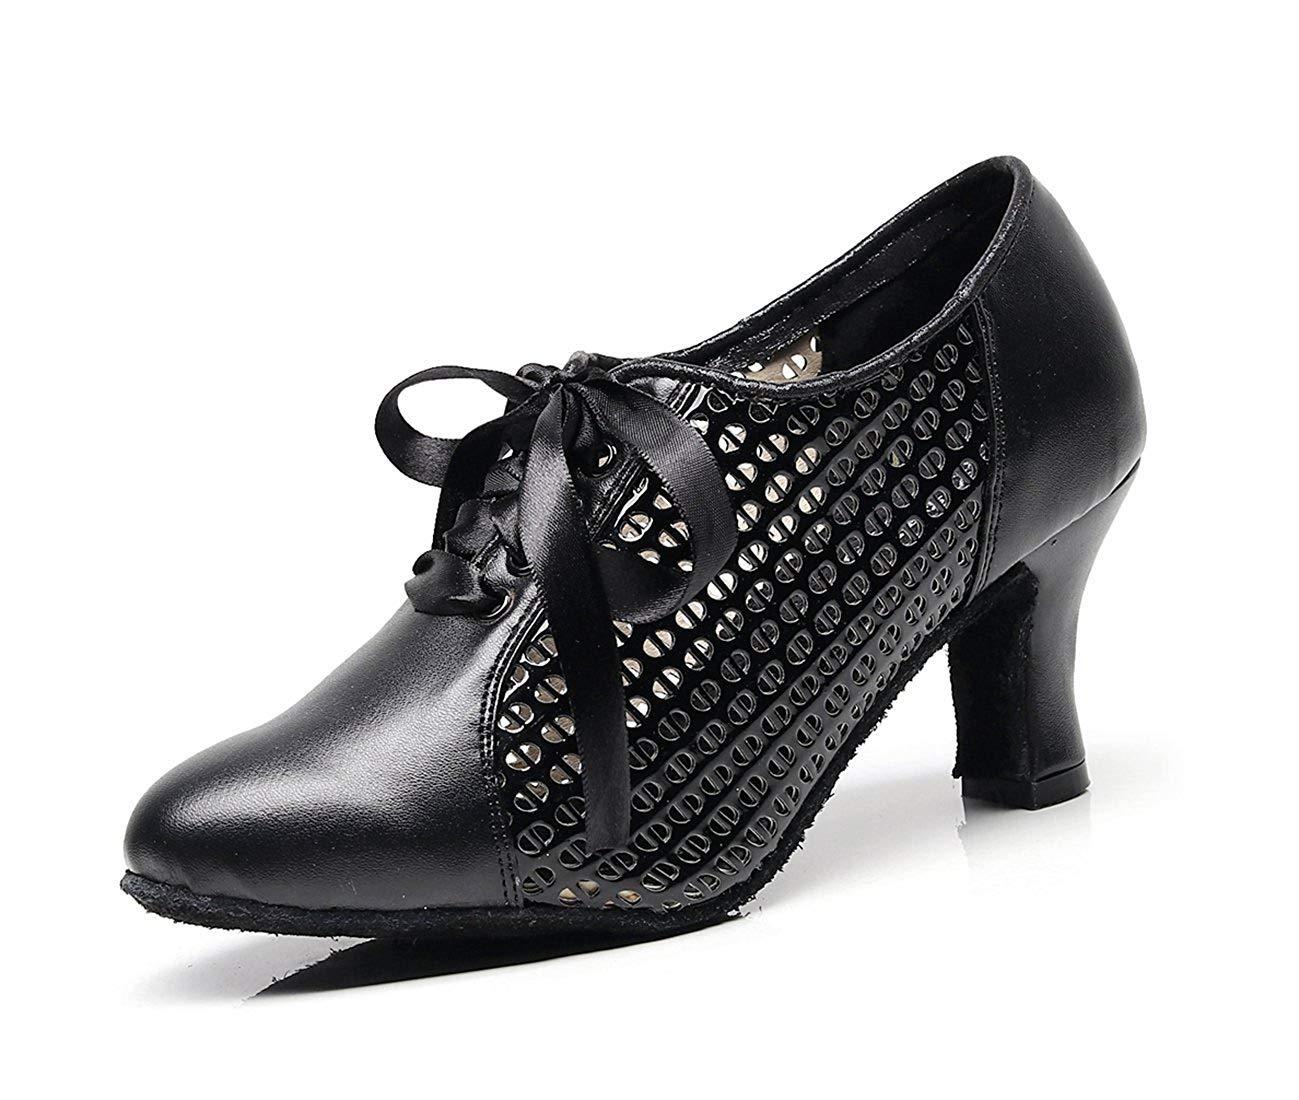 Qiusa Damen Mesh Lace-up Schwarz Synthetische Chunky Low Heel Latin Ballroom Tanzen Pumps Abendschuhe UK 4 (Farbe   - Größe   -)